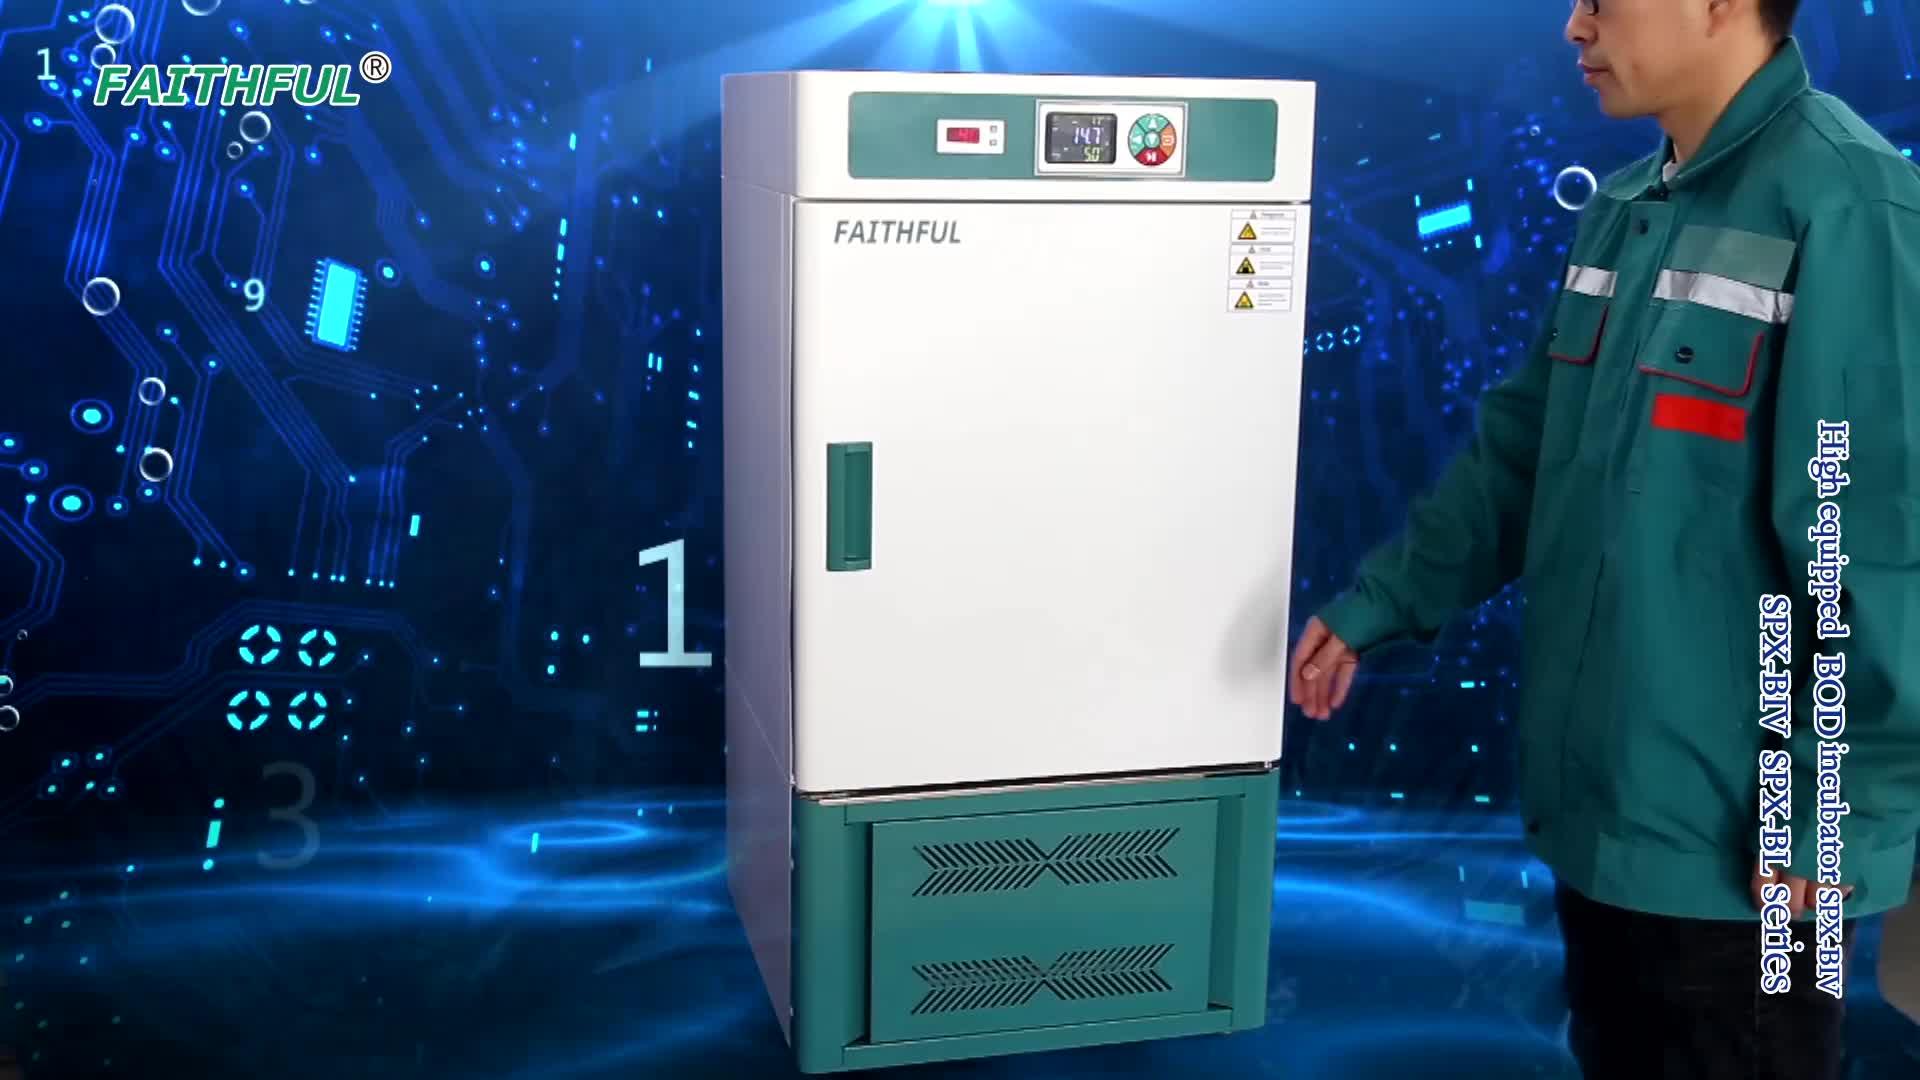 Hohe qualität labor thermo digitale präzision kühlung inkubator/automatische inkubator/kühl inkubator